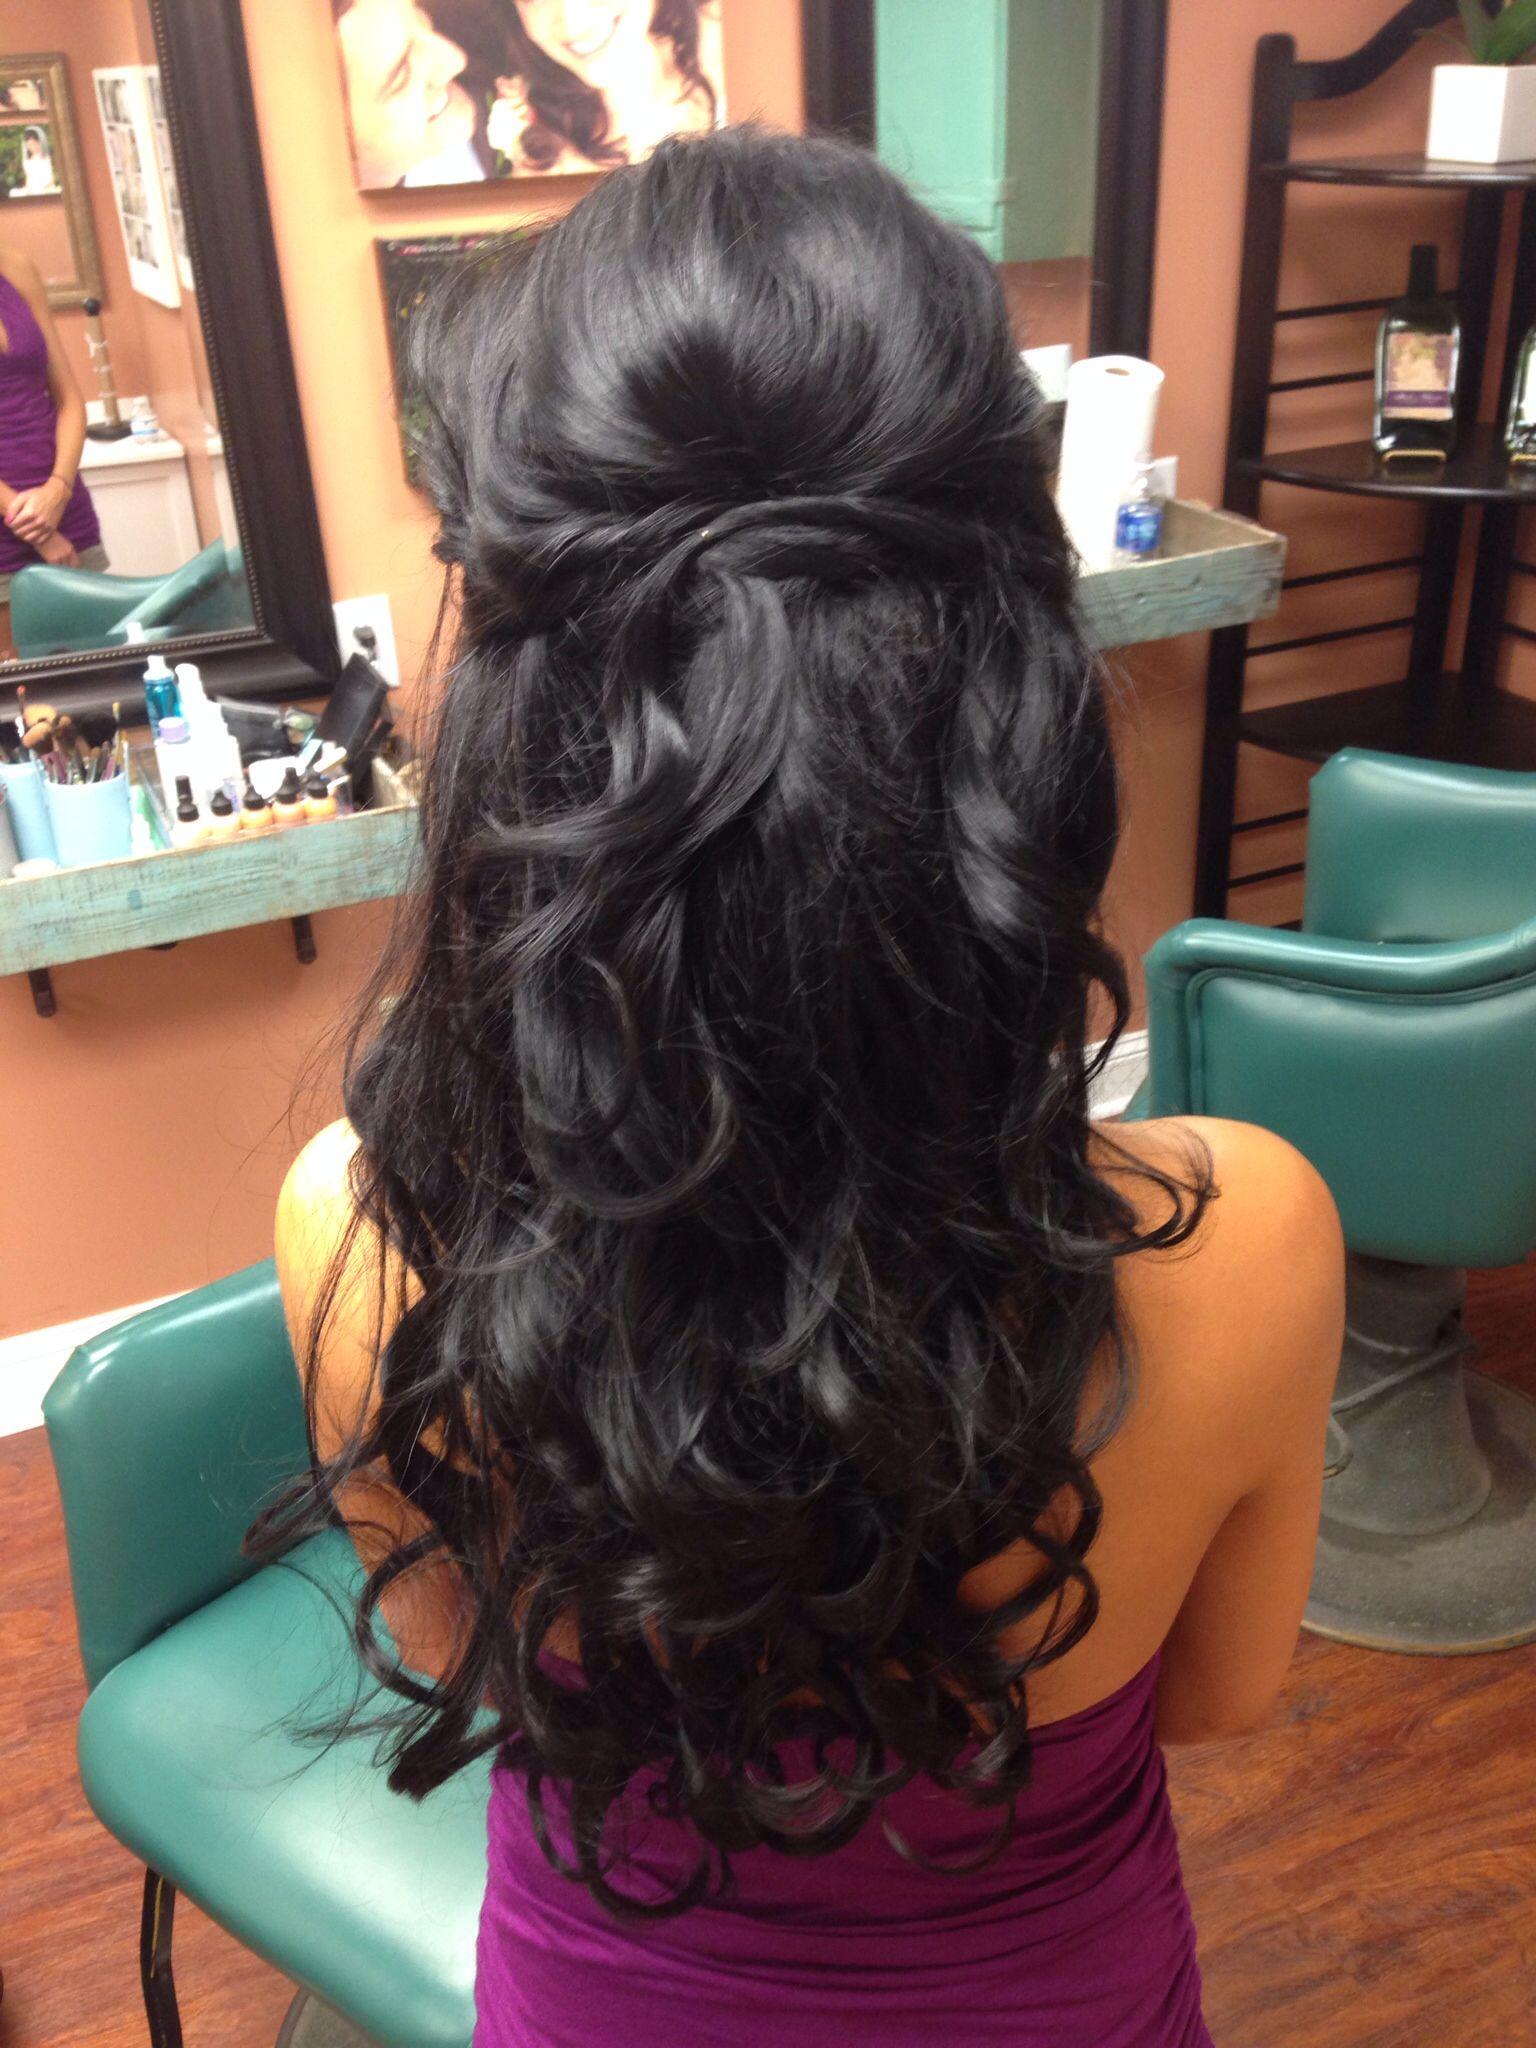 Wedding hair trial half up Hair ideas Pinterest Wedding